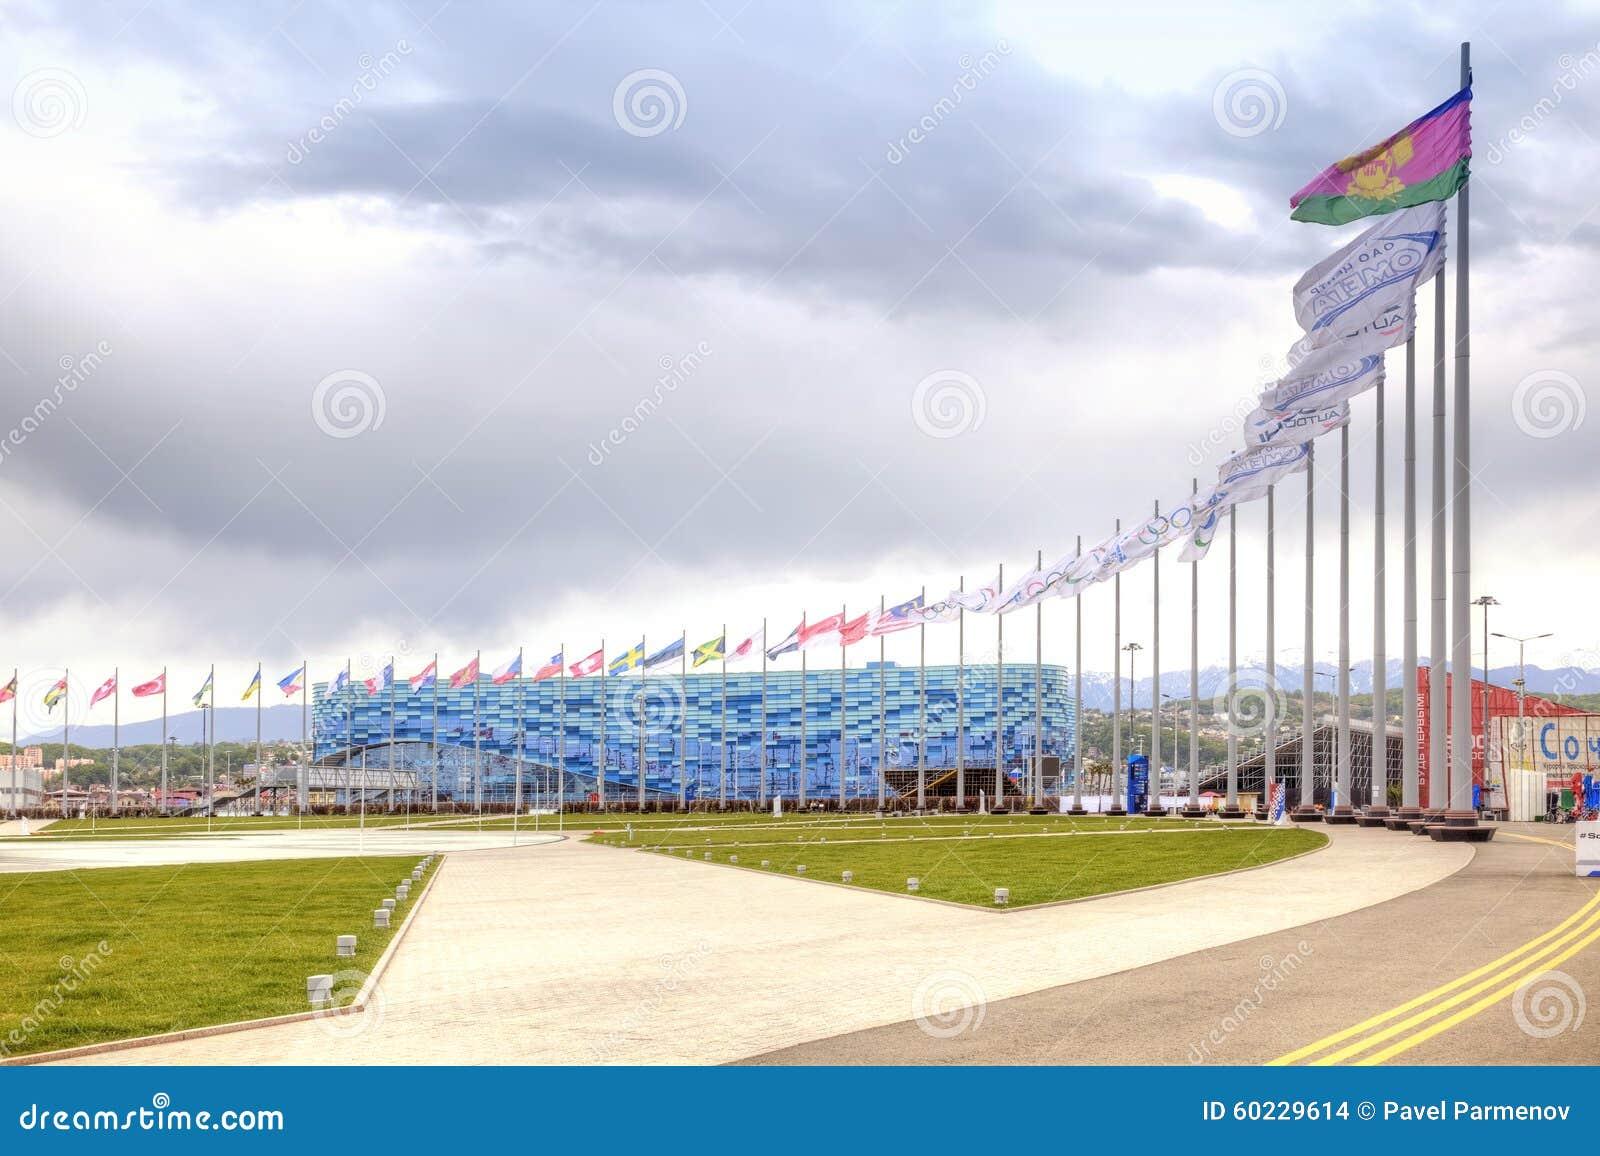 Sochi Área olímpica